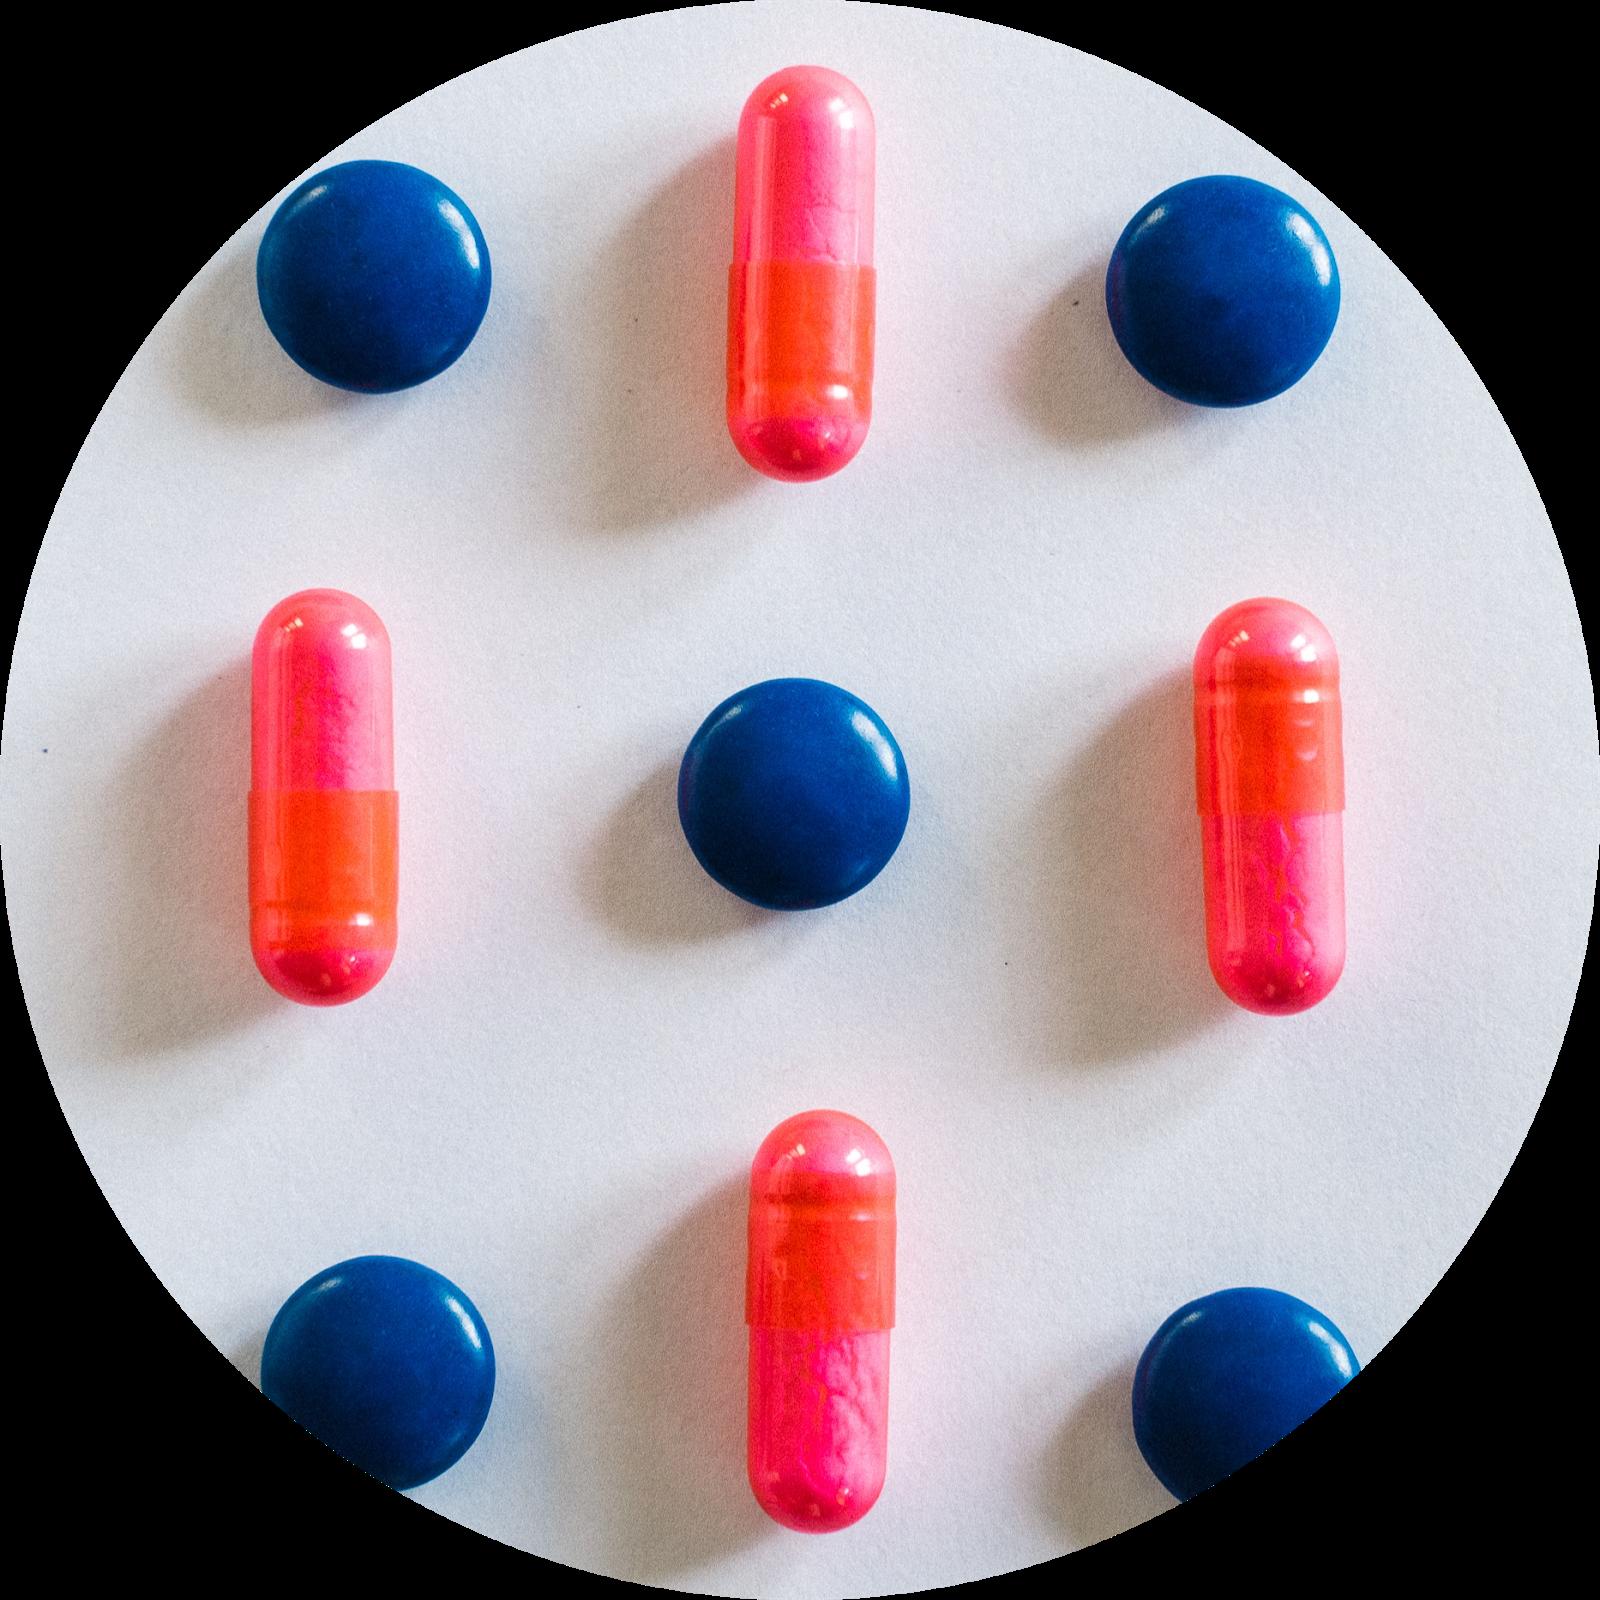 How Long Does Viagra Last?